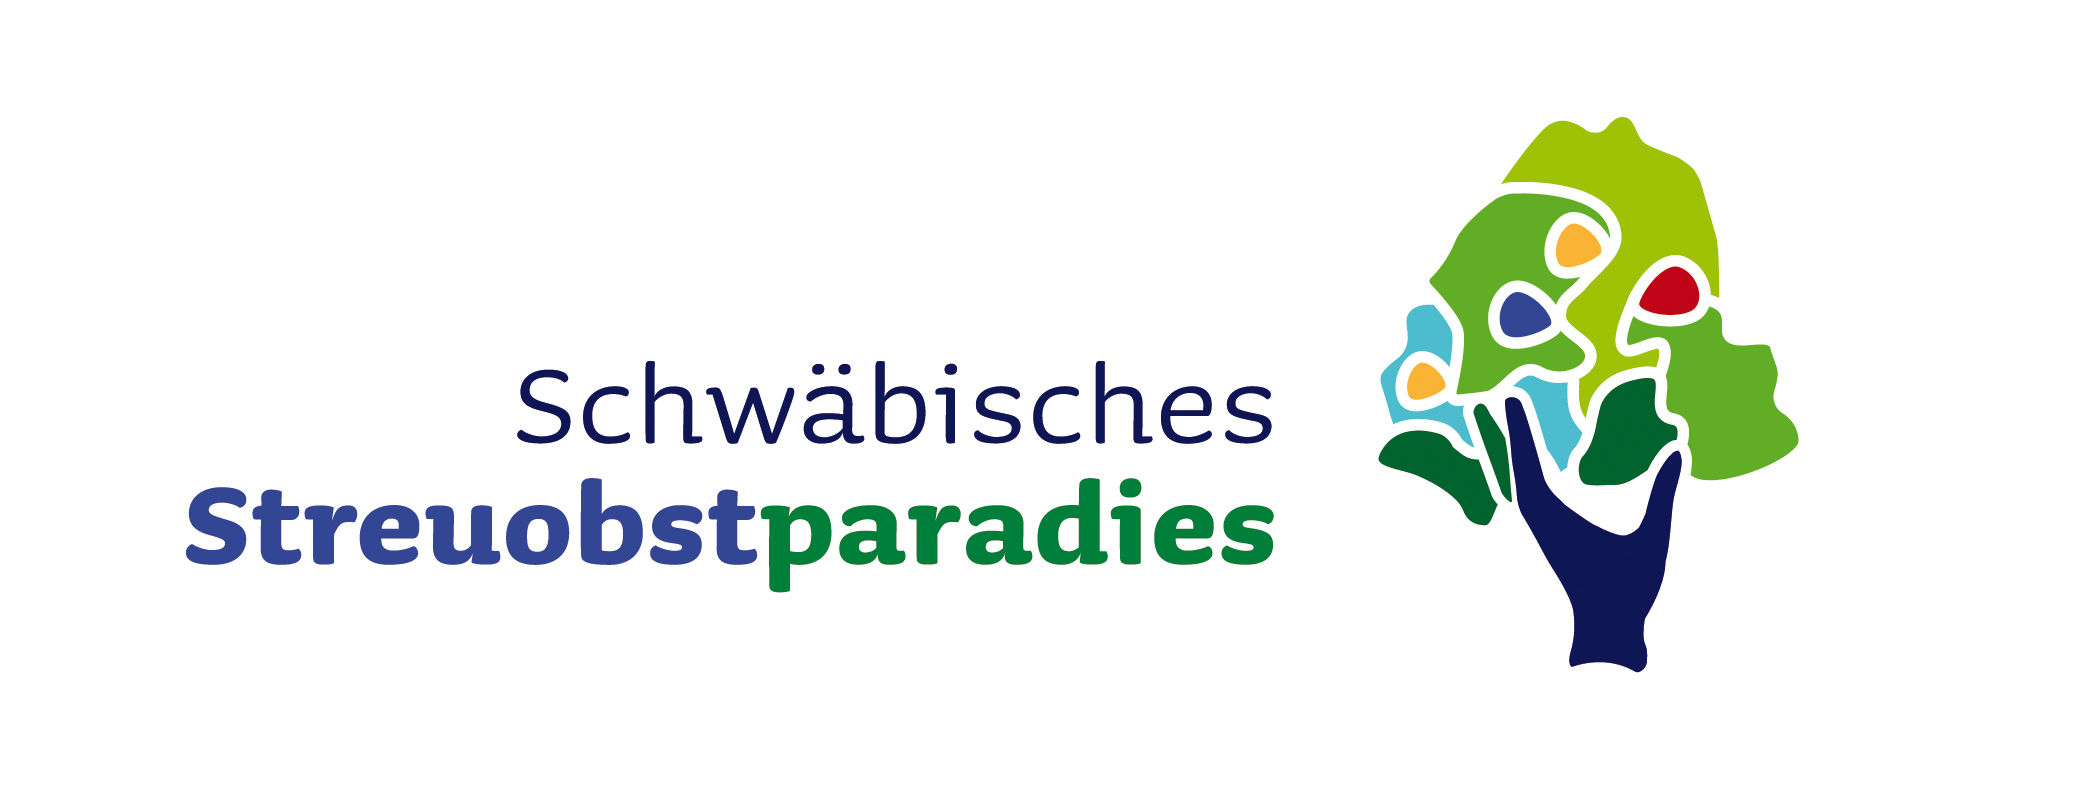 Logo Streuobstparadies